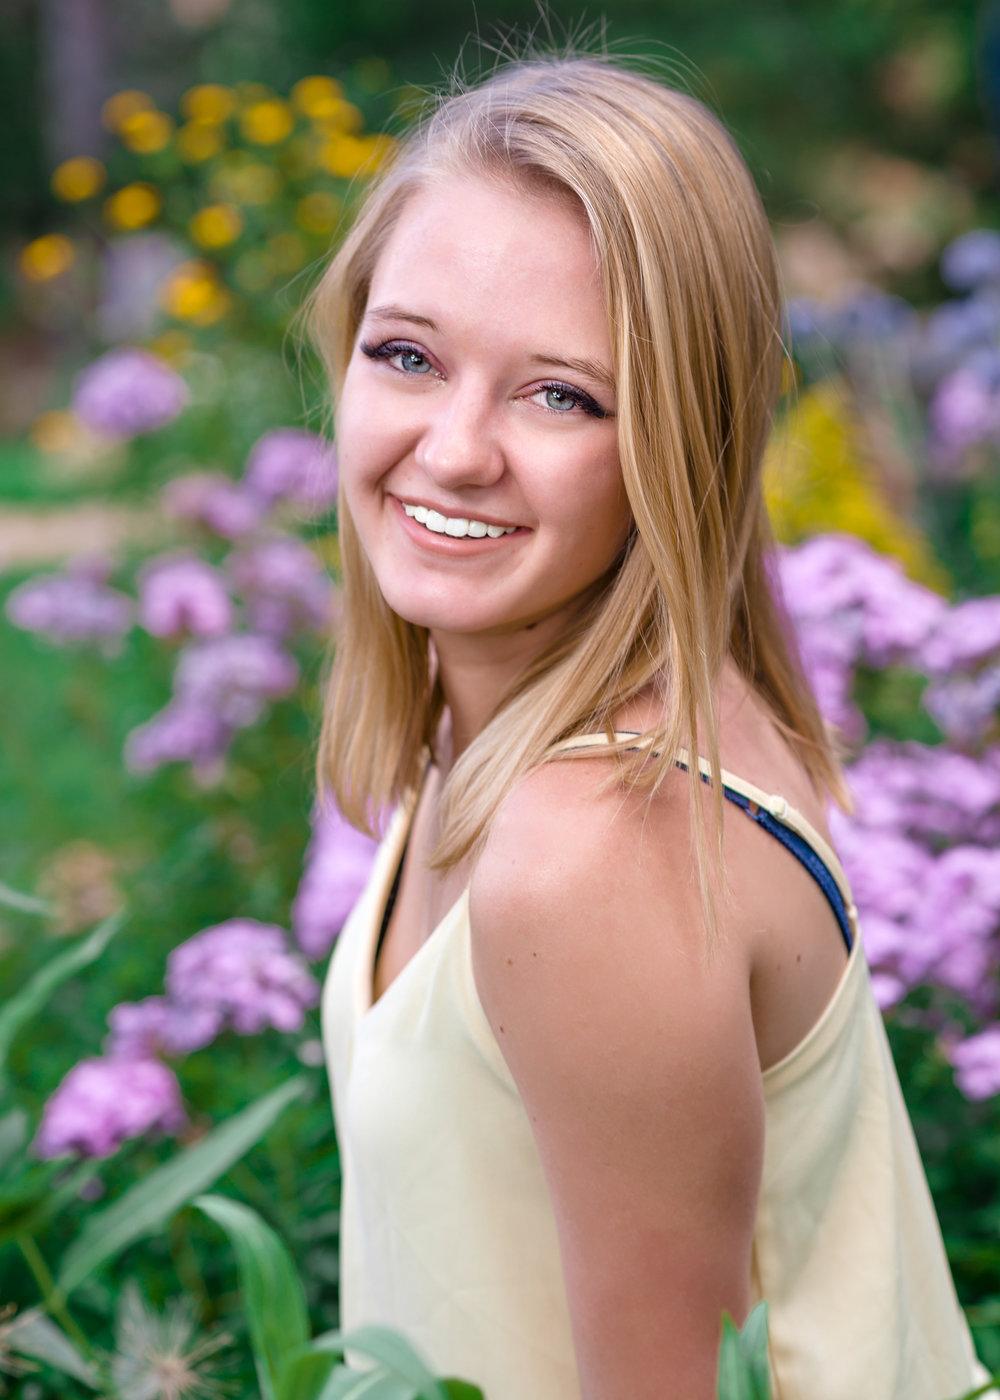 Kaitlyn N, Senior Shoot, 8_20_17, RWF, Lo Res JPEG for Social Media_D6X4606-Edit PC.jpg